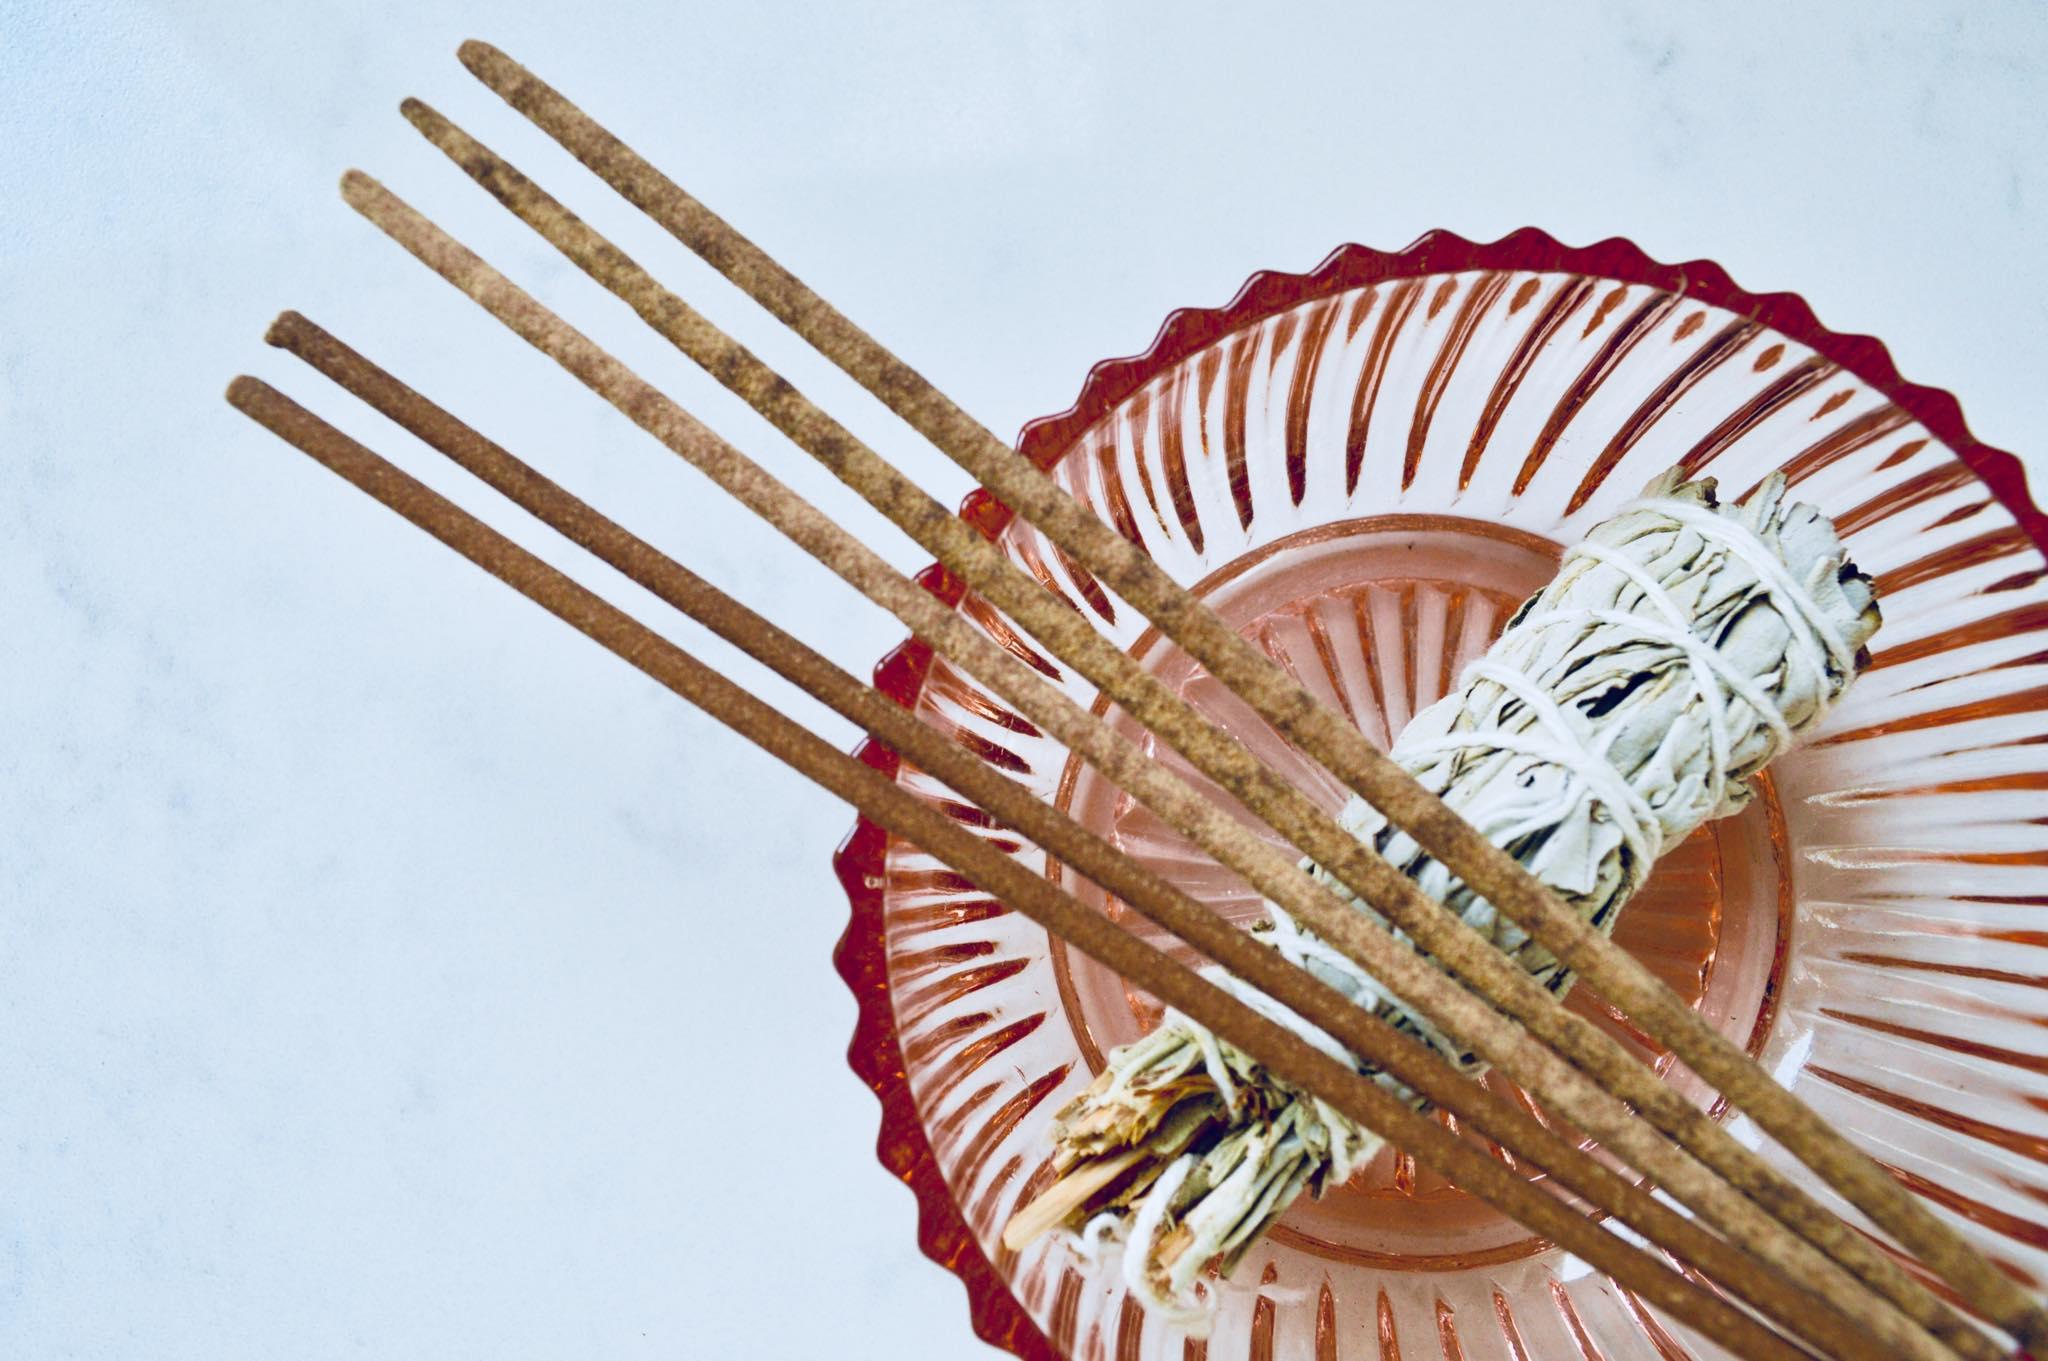 incense, modern homestead, minimalism, simple living